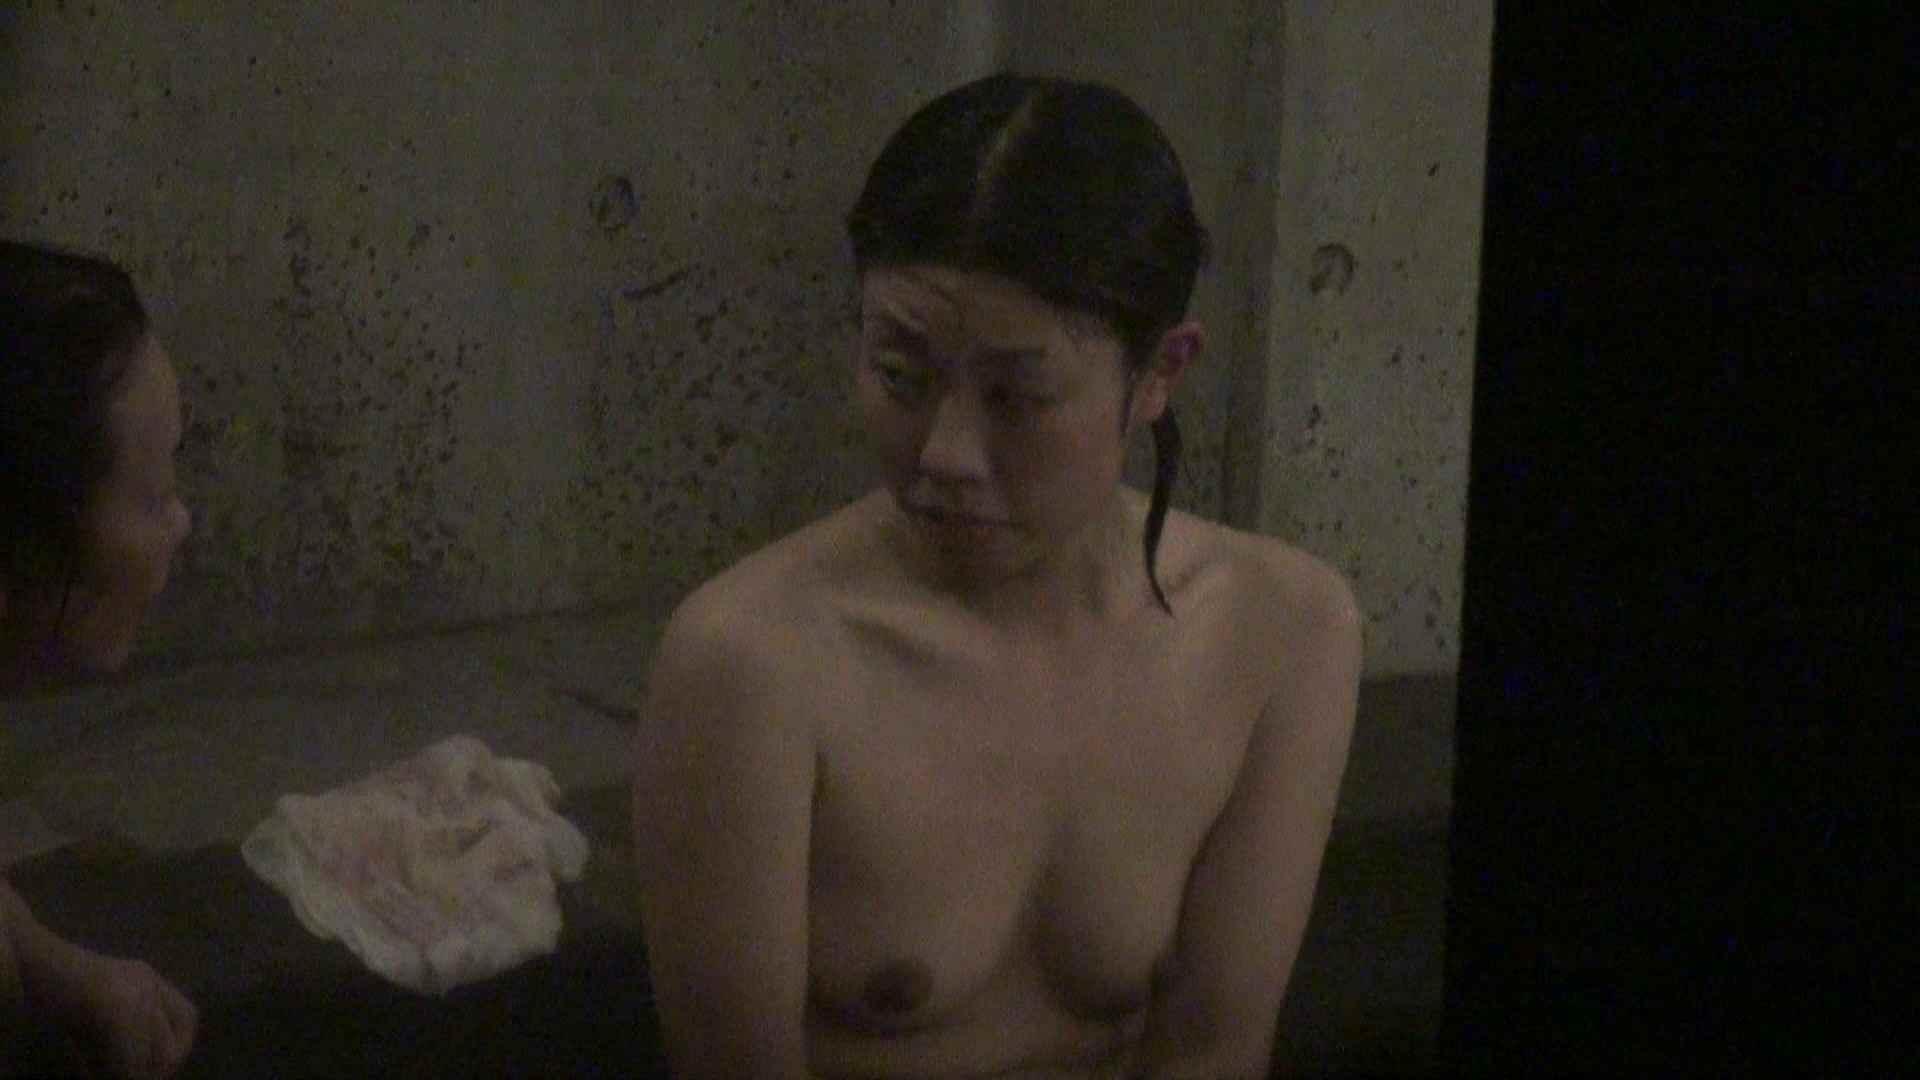 Aquaな露天風呂Vol.330 盗撮   HなOL  83pic 16